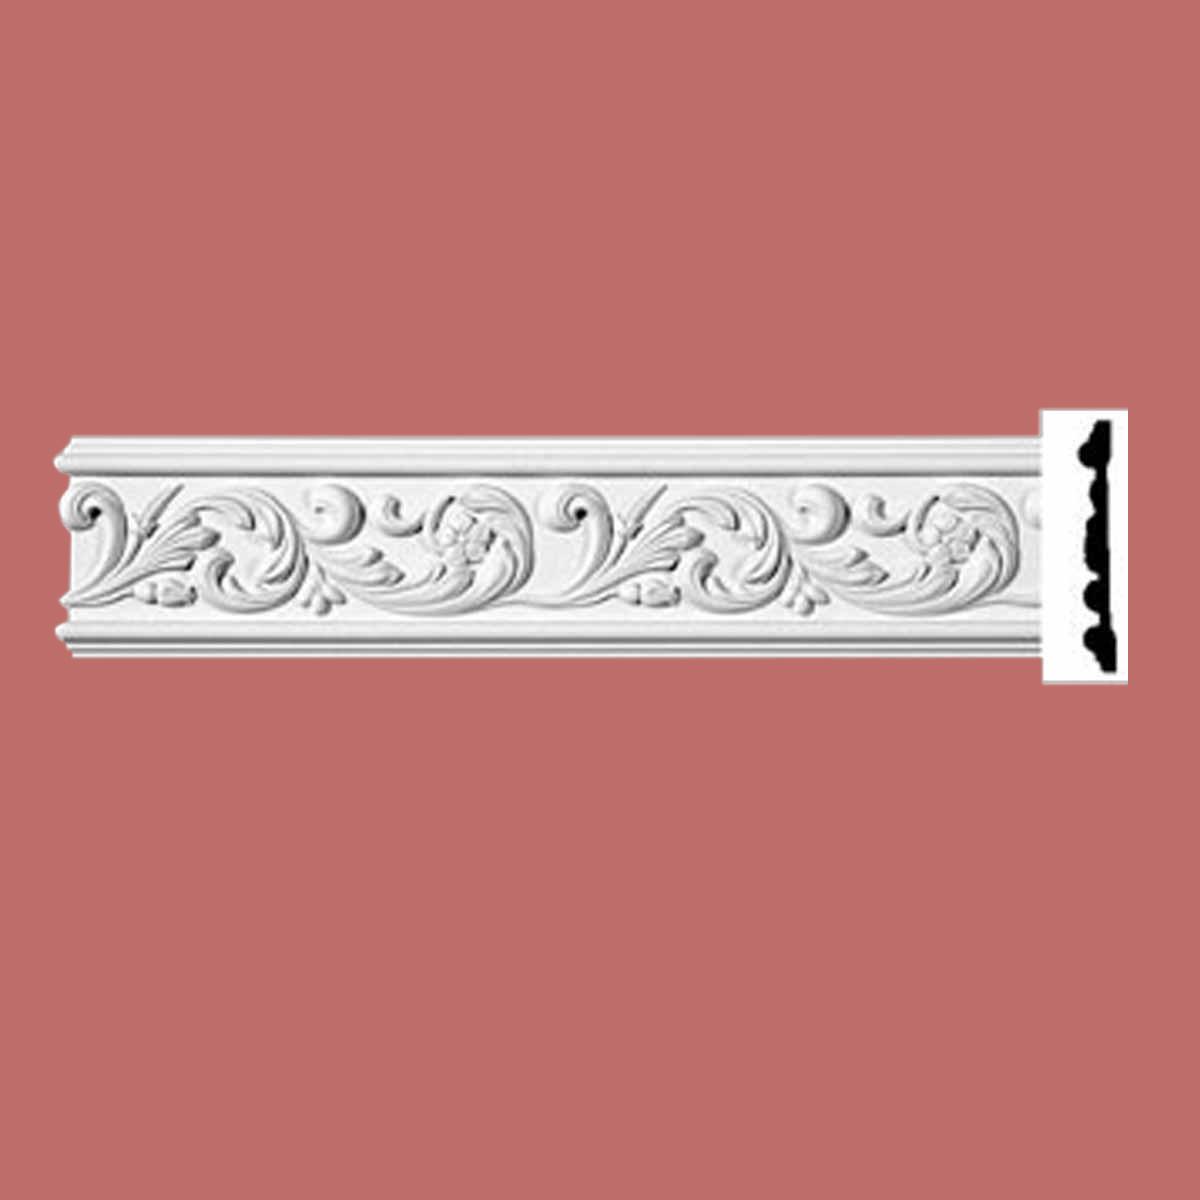 Cornice White Urethane Sample of 11596 24 Long Cornice Cornice Moulding Cornice Molding